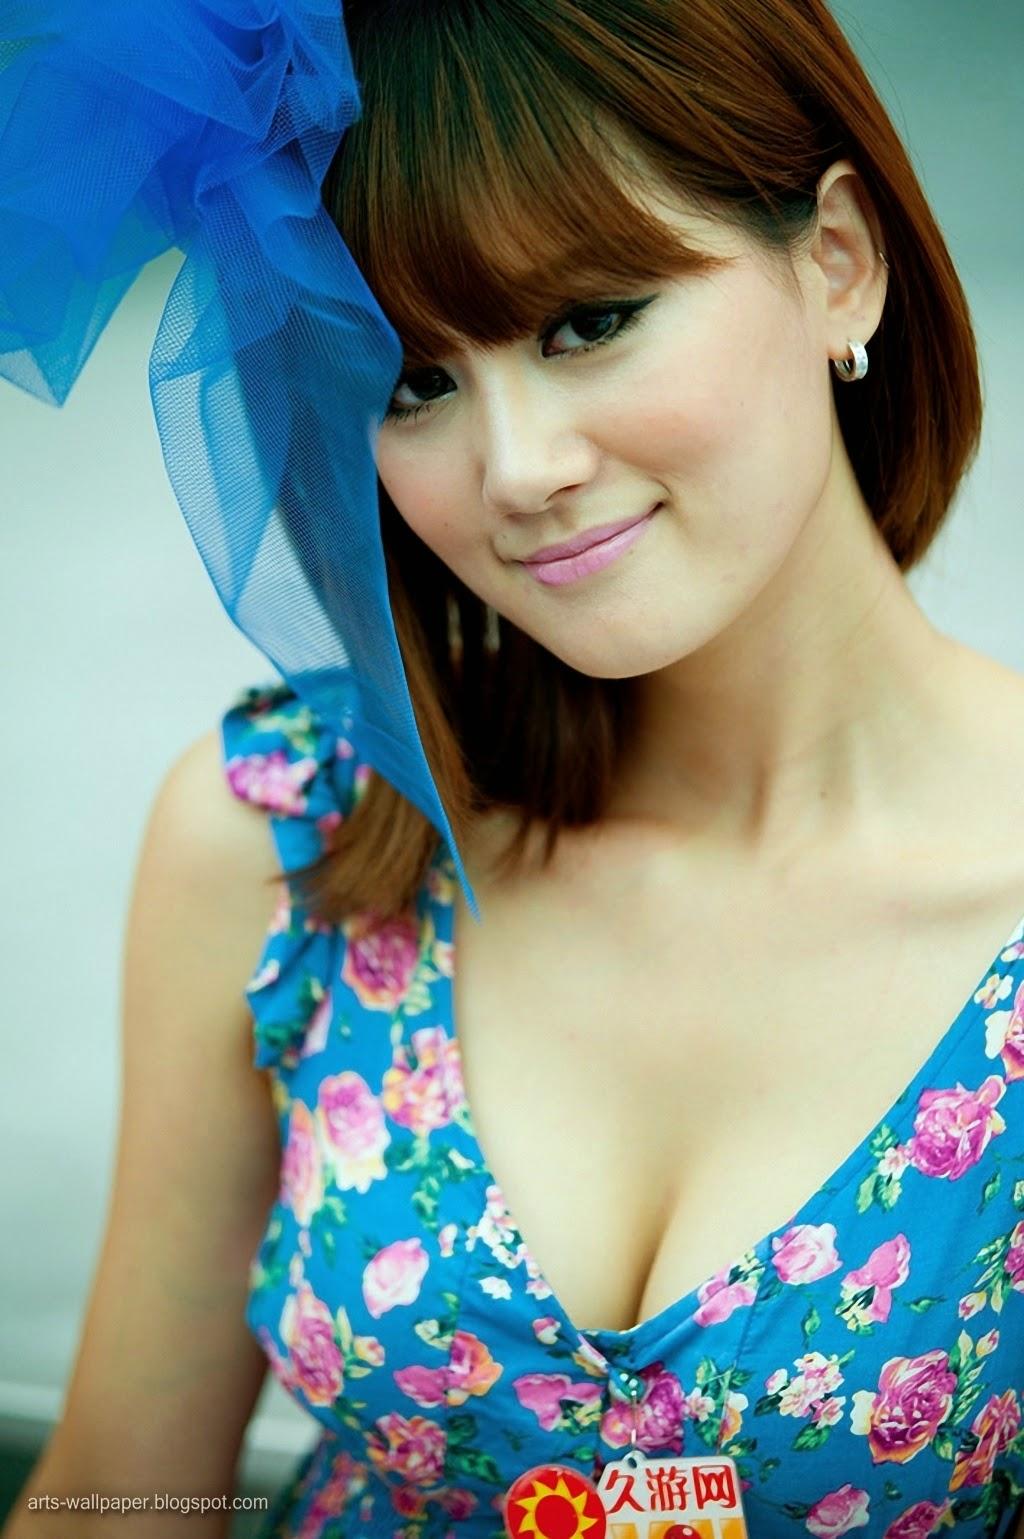 Wanita Tercantik di Dunia - Wartawan.id - Update Berita